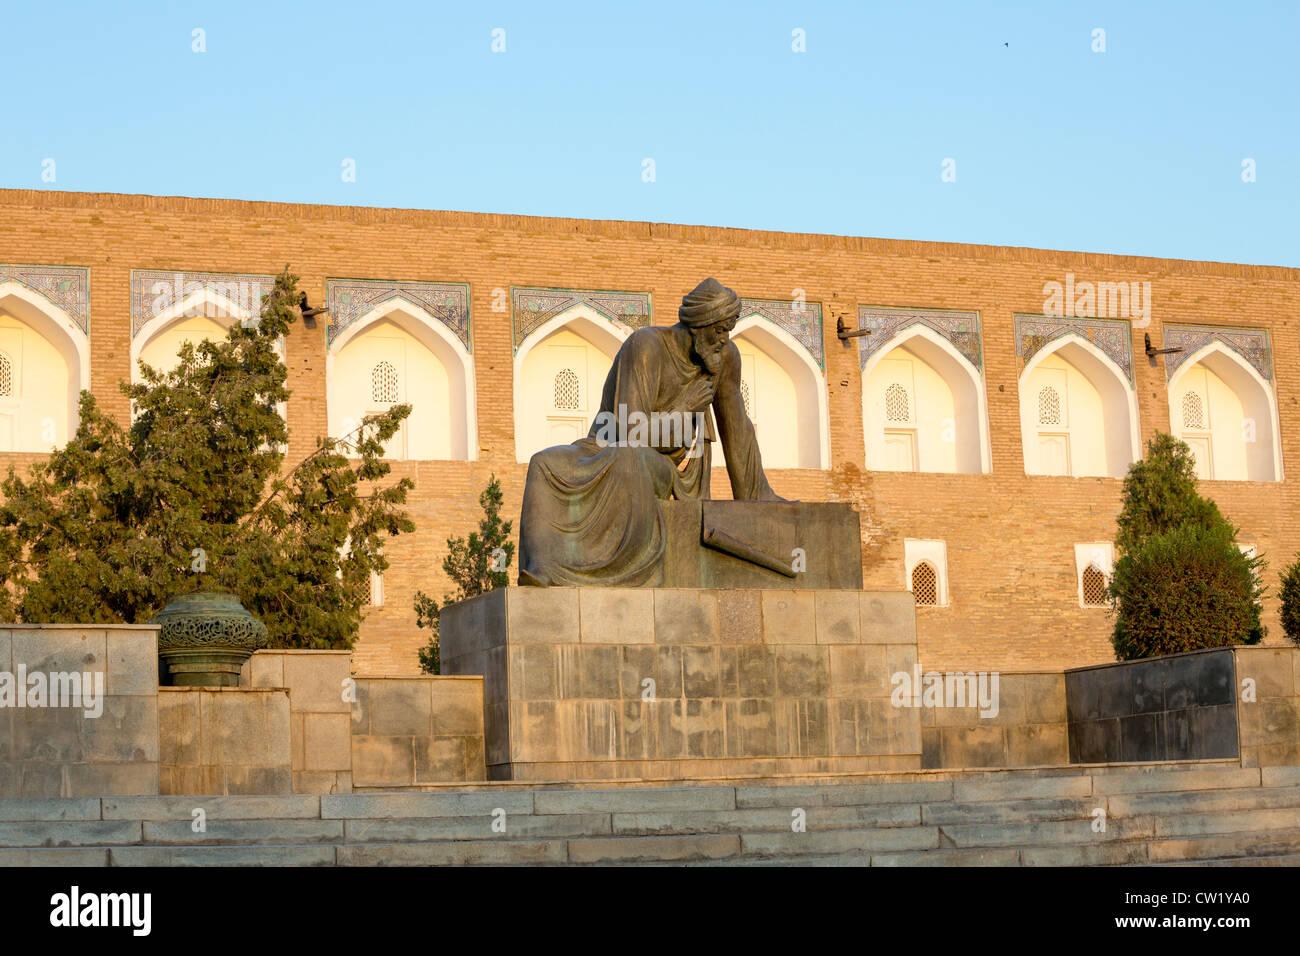 statue of the mathematician al-Khwarizmi, Khiva, Uxbekistan - Stock Image